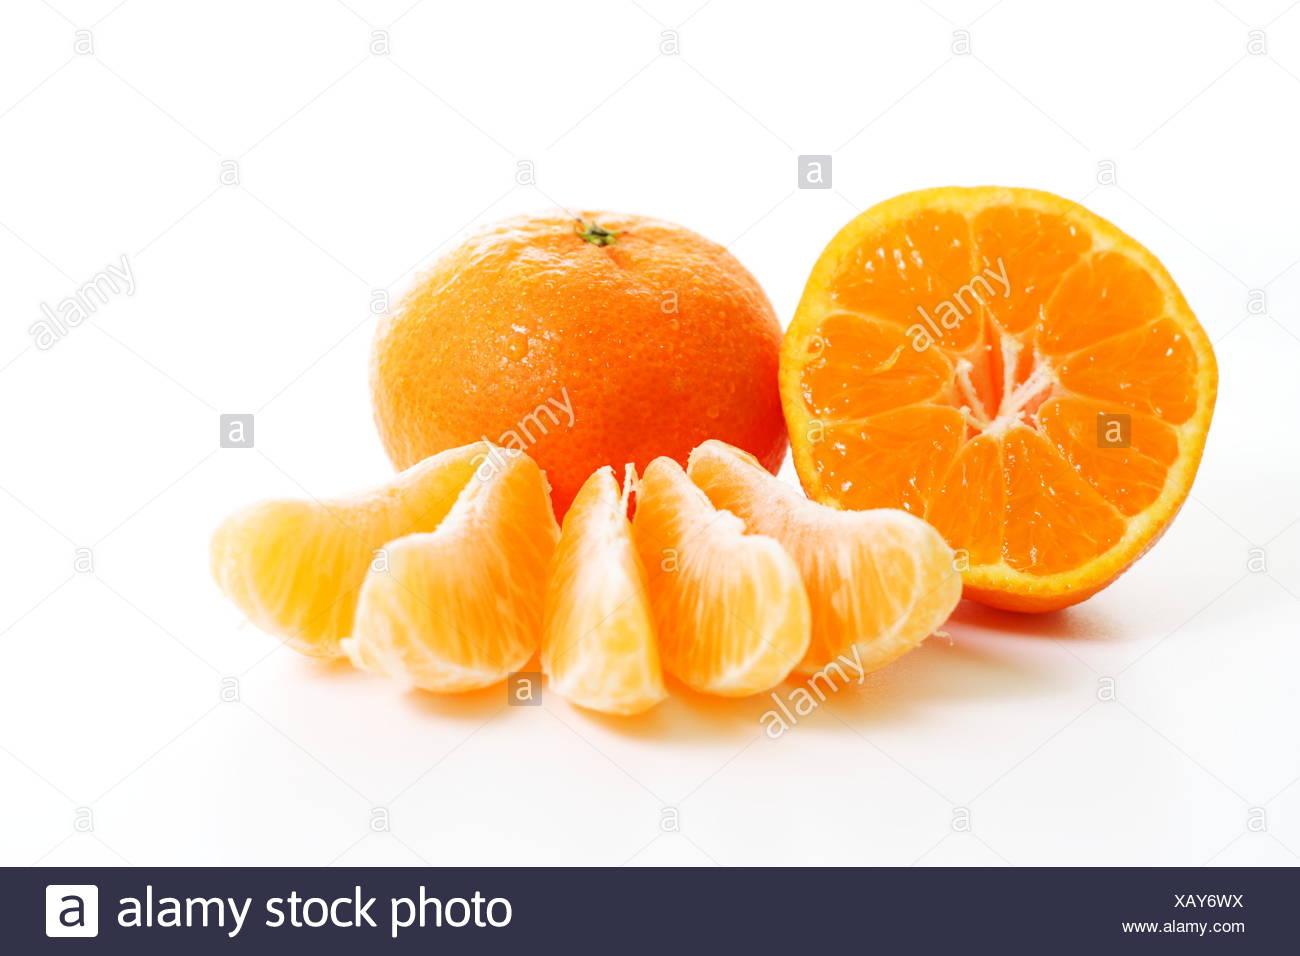 Orangen essen Nahrungsmittel isoliert Stammarten Obst Obst Mandarinen Mandarinen orange Stockbild